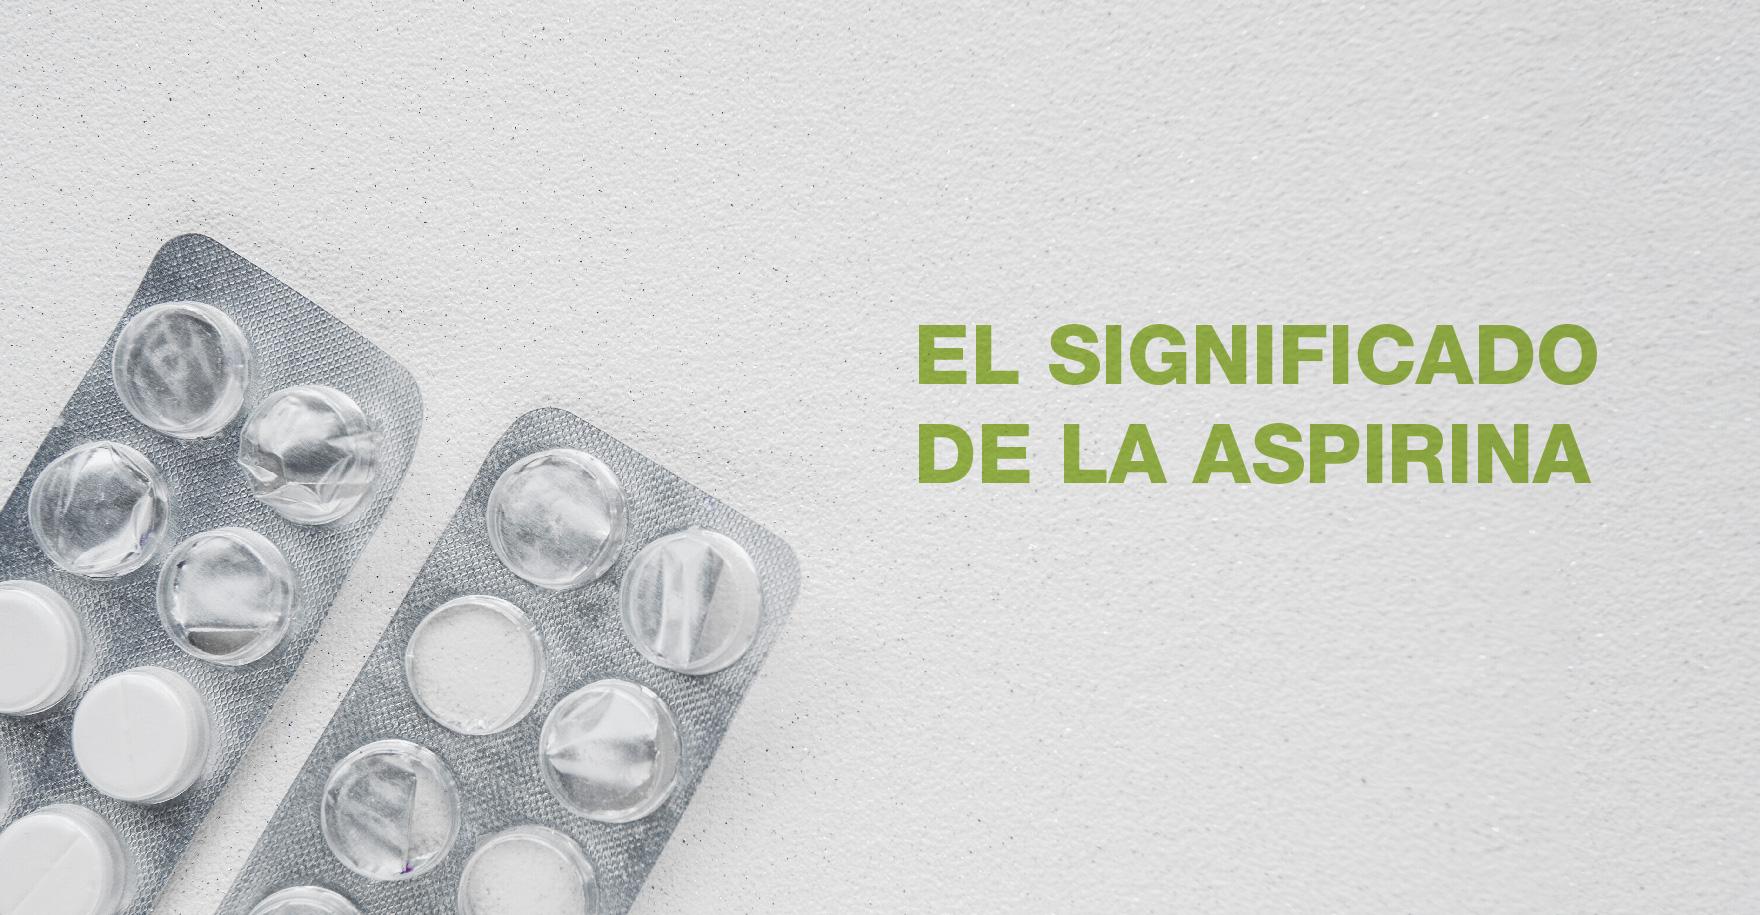 Significado Aspirina Pura Vida Badalona